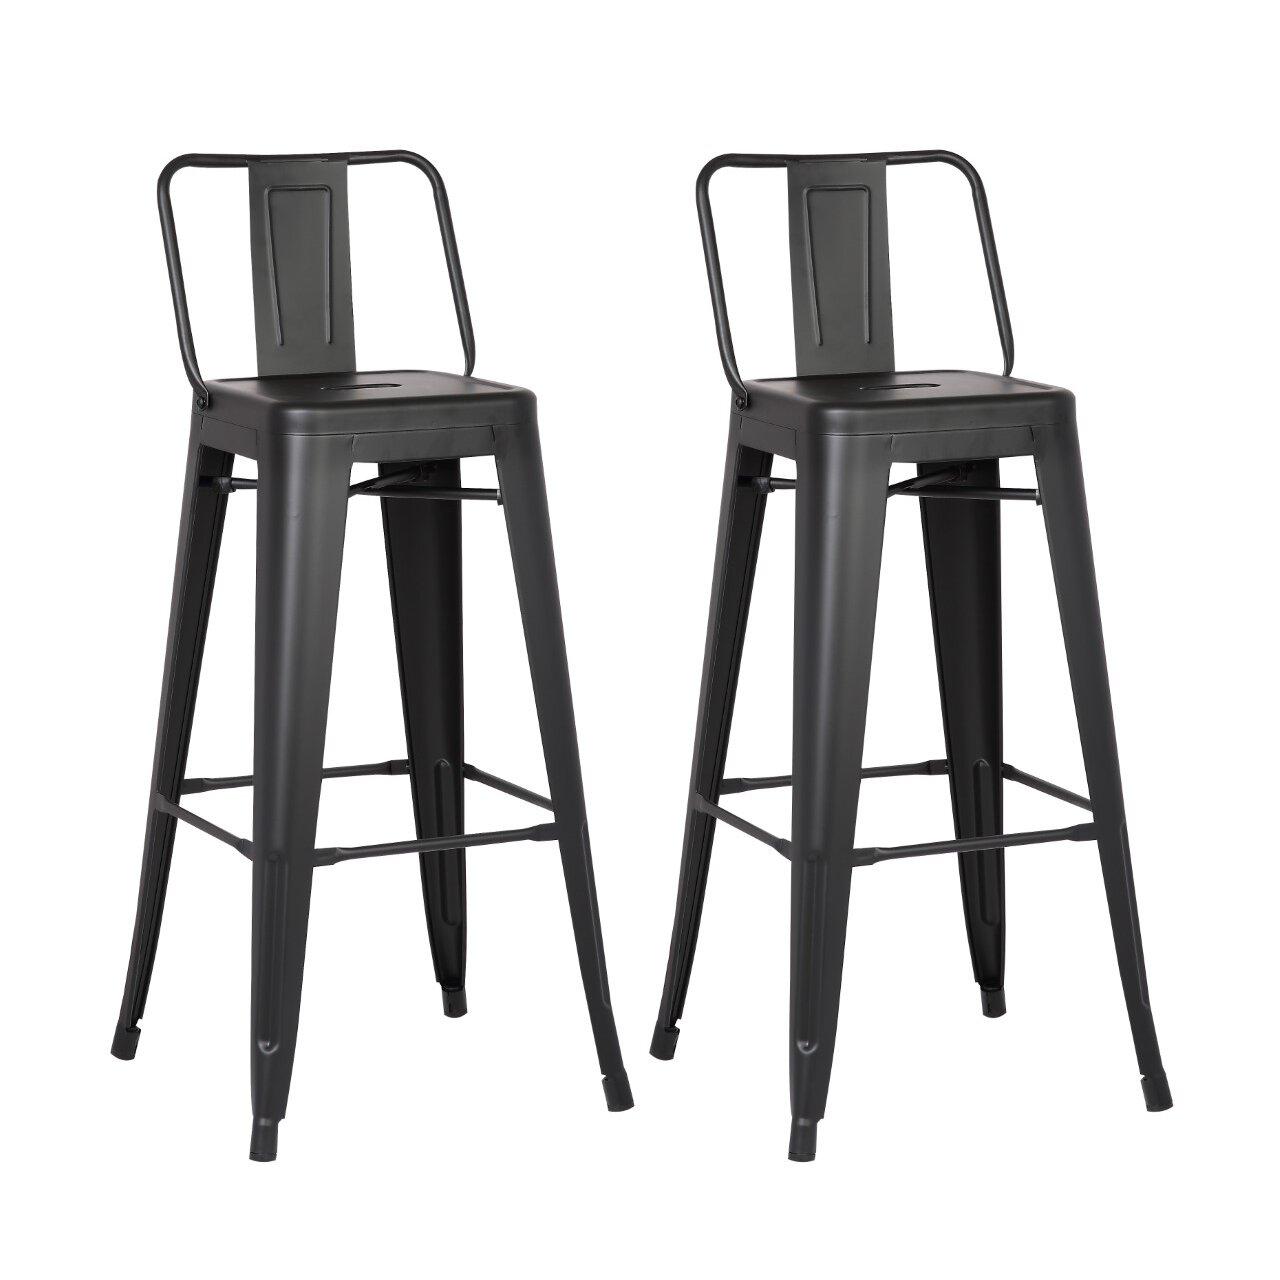 Ac pacific 30 bar stool reviews wayfair for Black bar stools